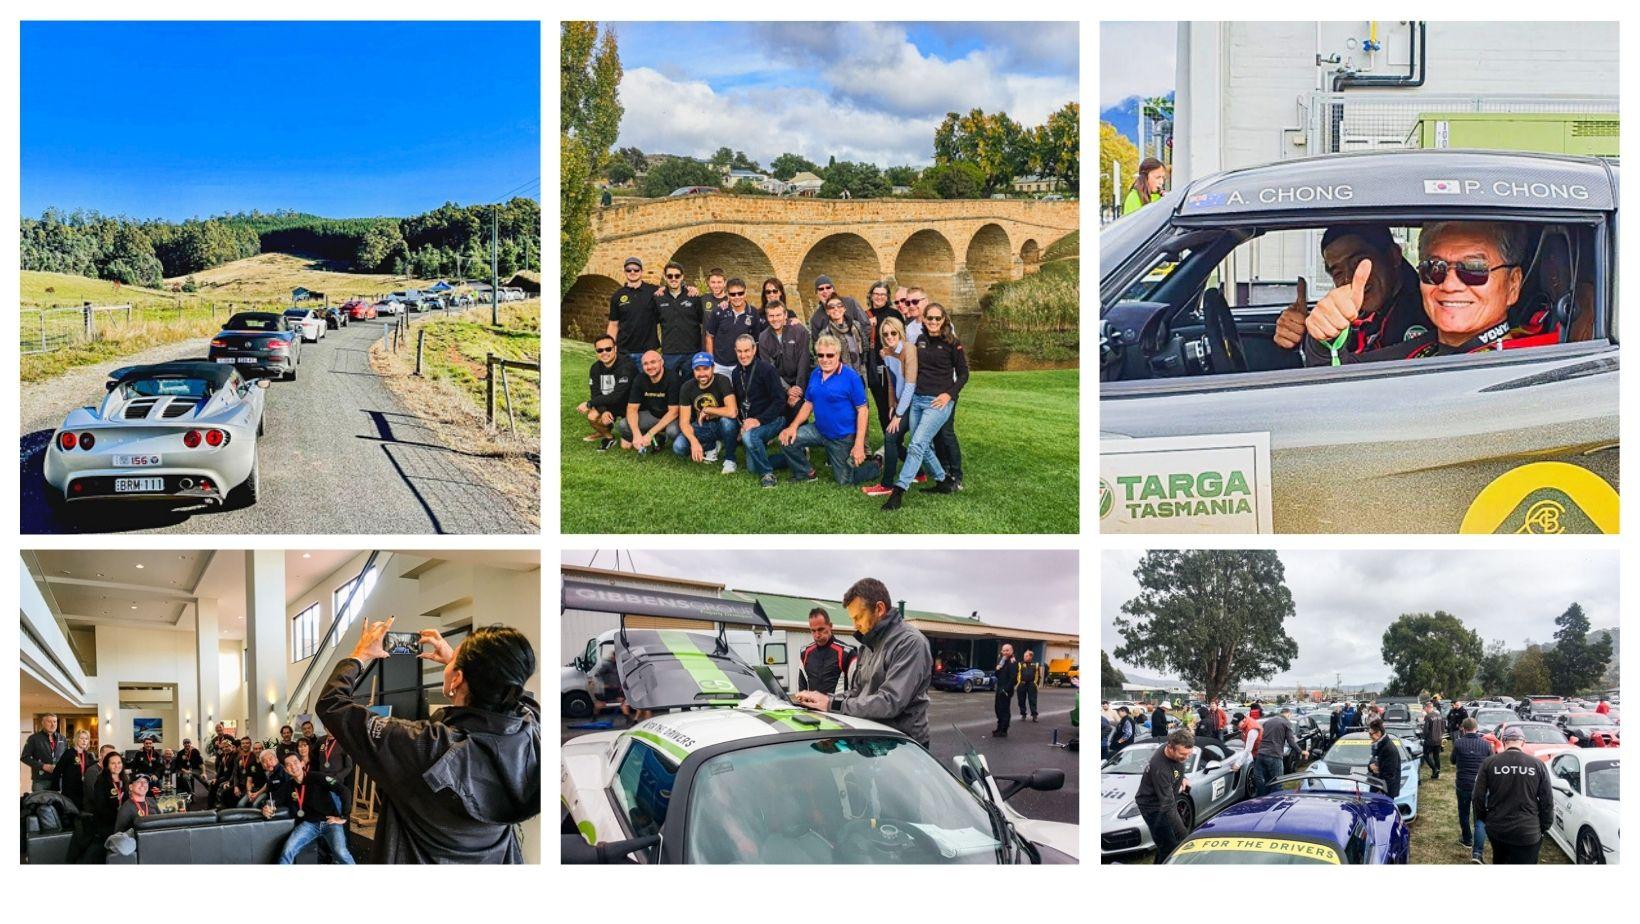 Lotus Cars Australia supporting drivers at Targa Tasmania